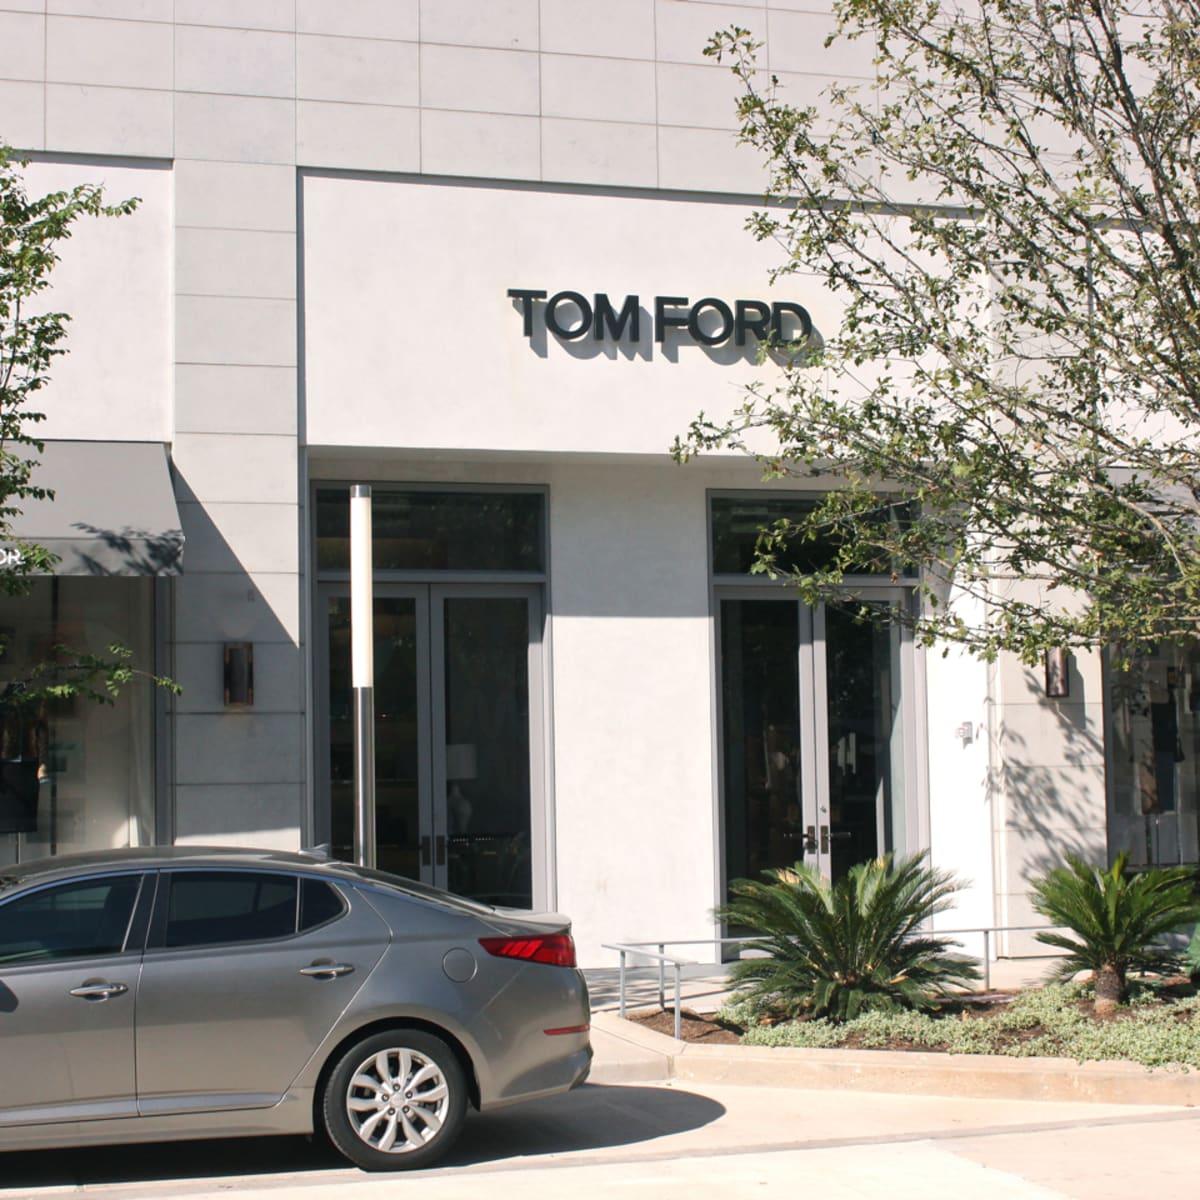 Tom Ford exterior River Oaks District